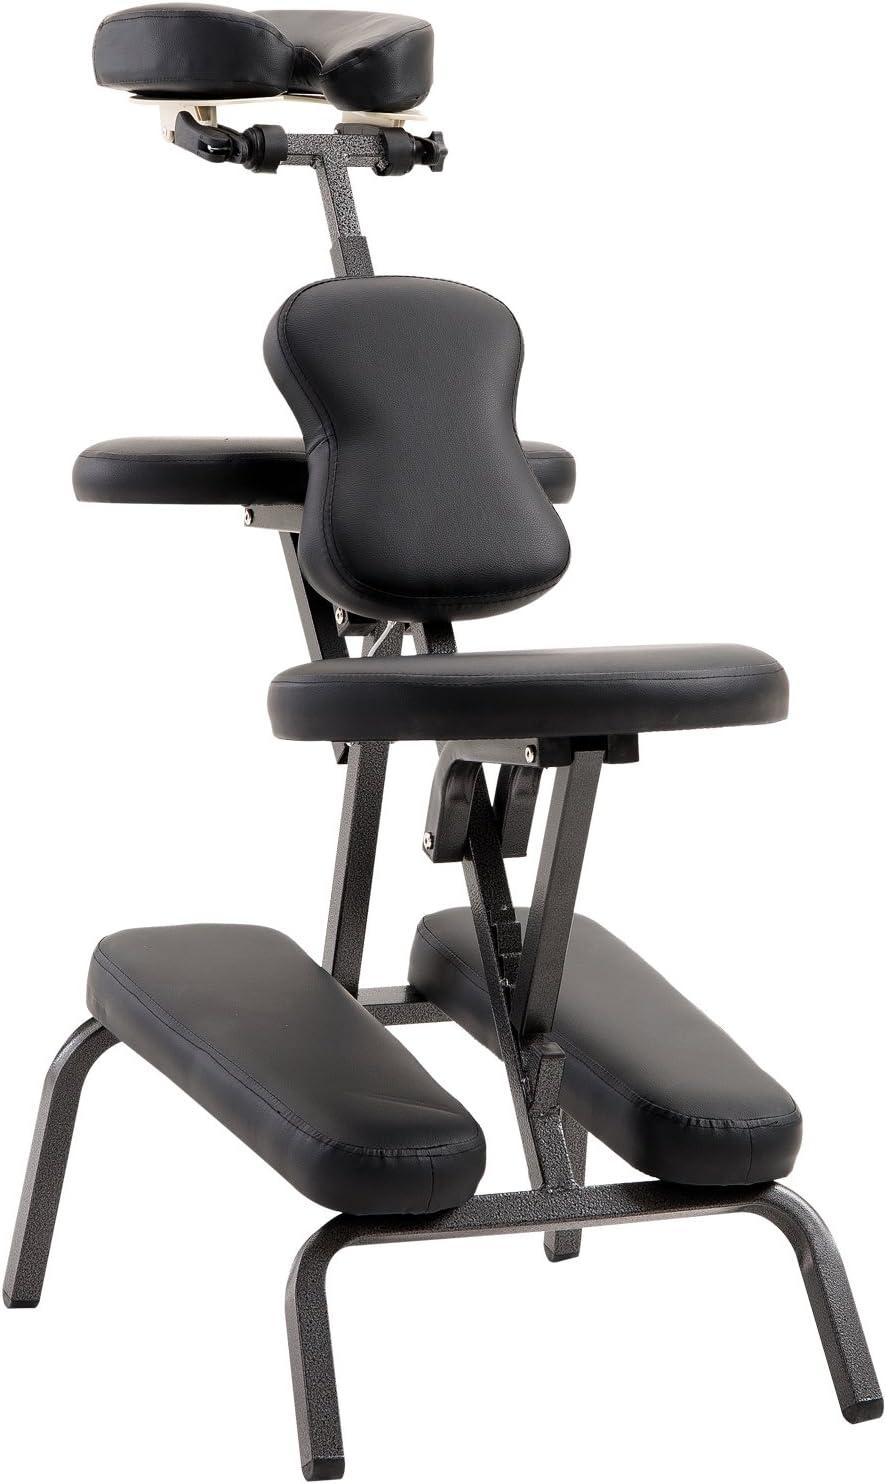 HOMCOM Silla de Masaje Plegable Portátil para Fisioterapia Rehabilitación Tatuaje Sillón de Tratamiento Ajustable con Bolsa de Transporte Acero Carga 150kg